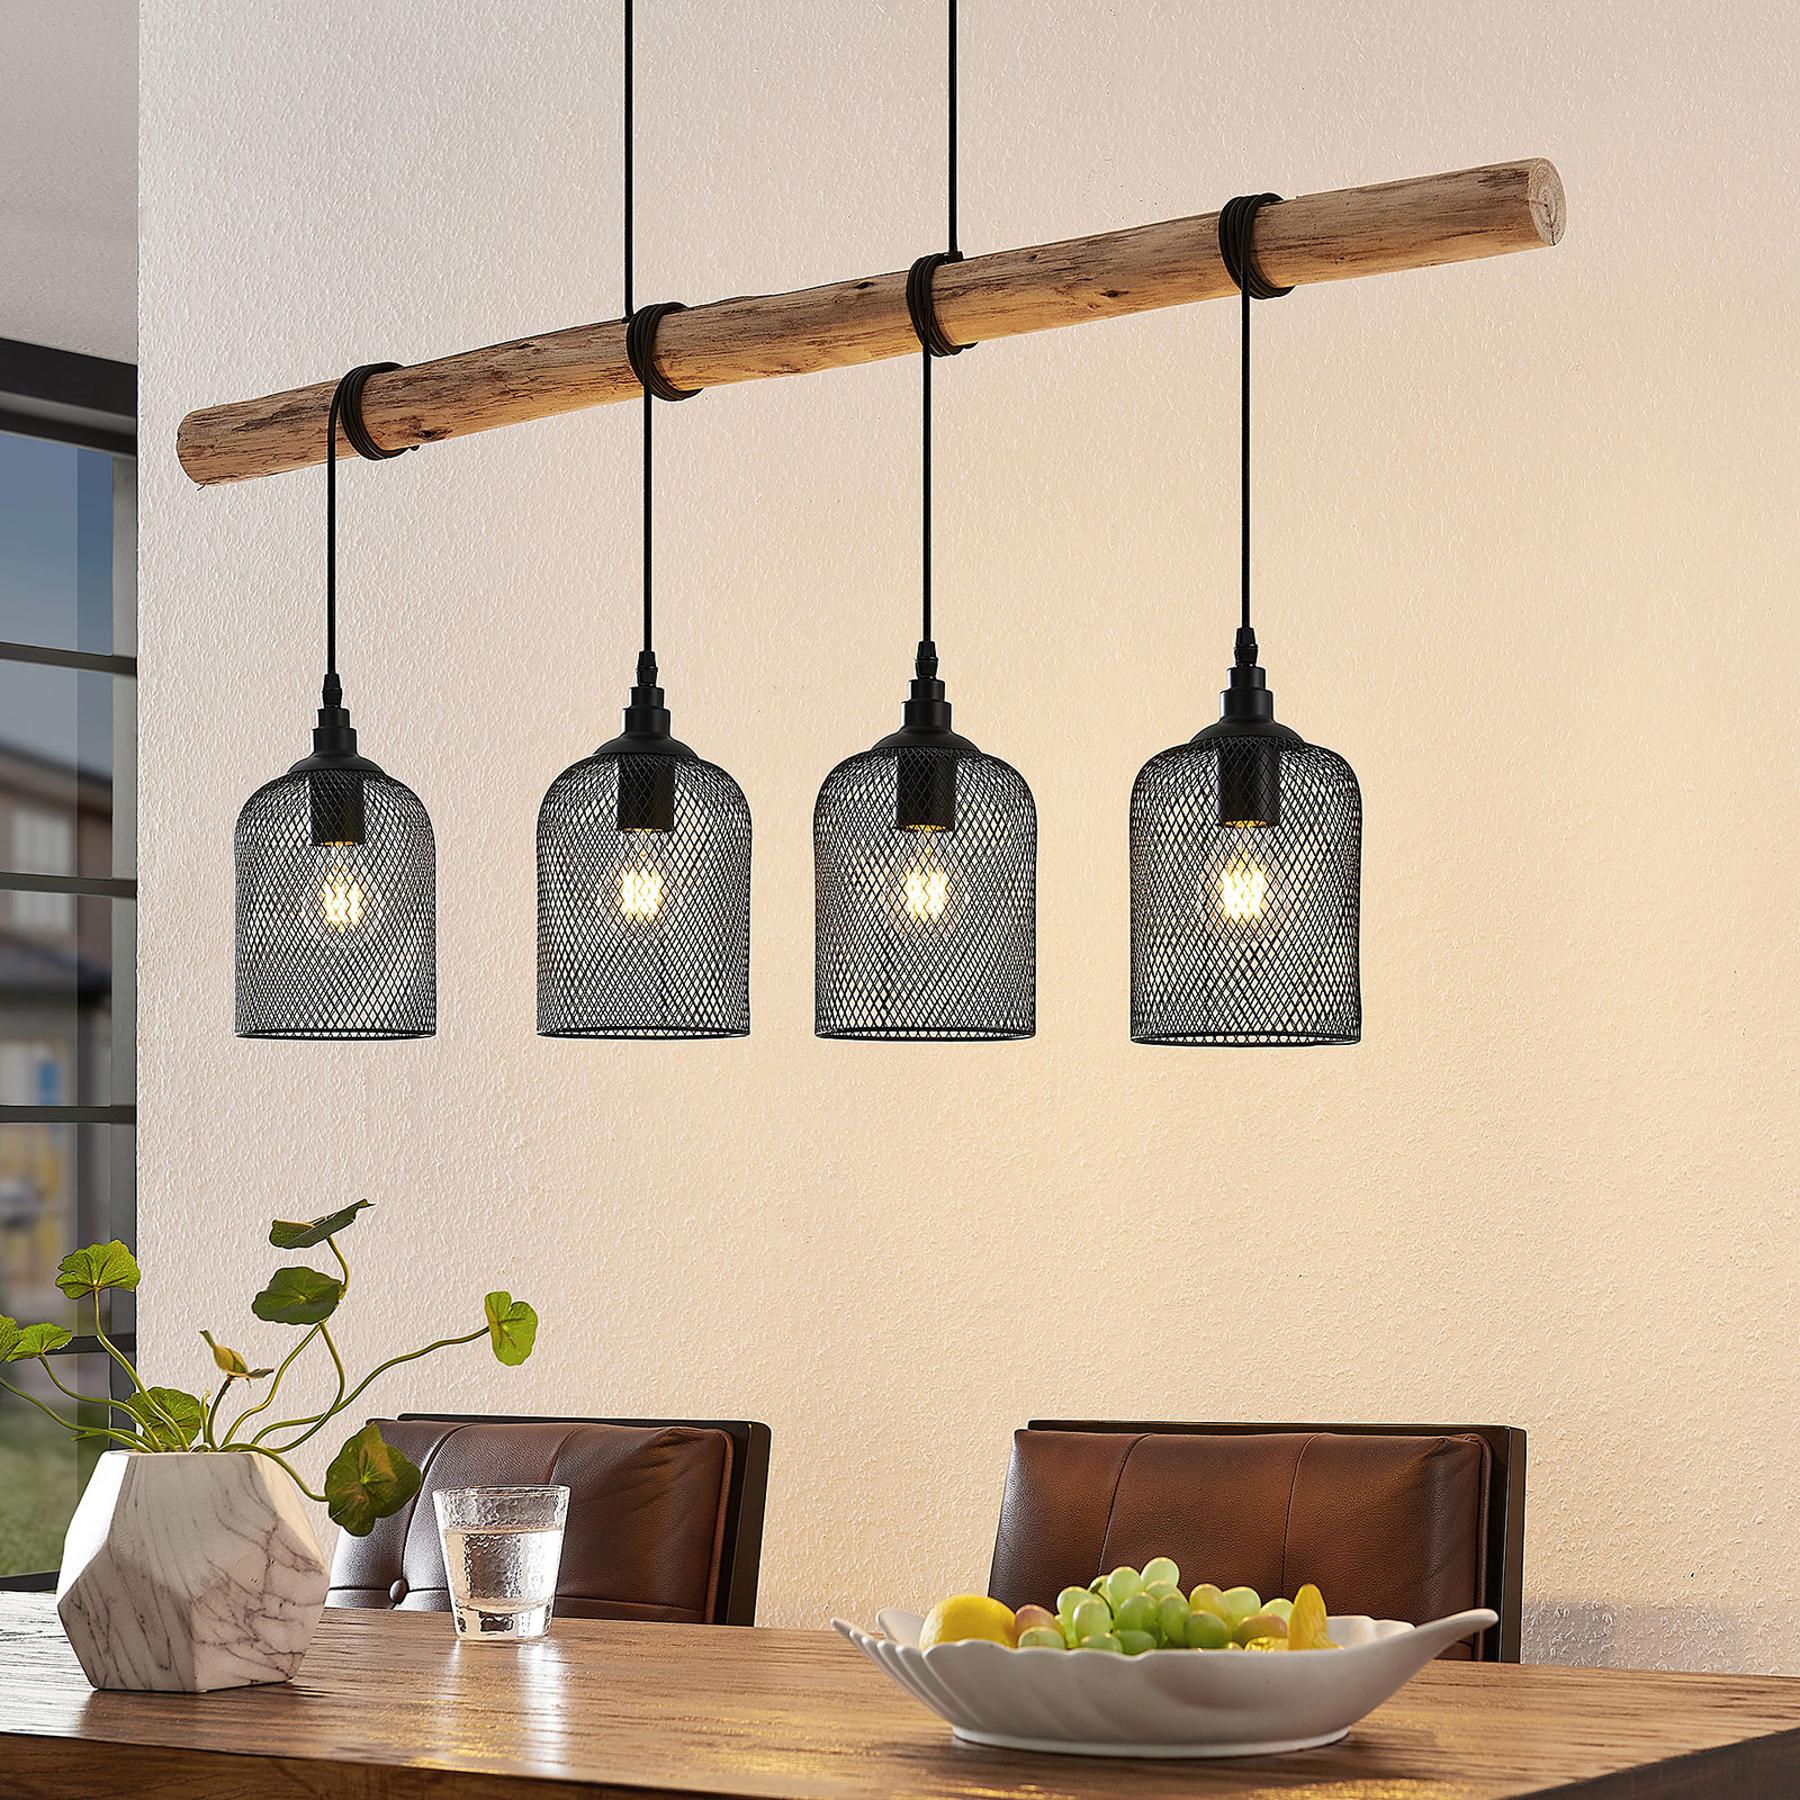 Lindby Elrond hanglamp met hout, 4-lamps